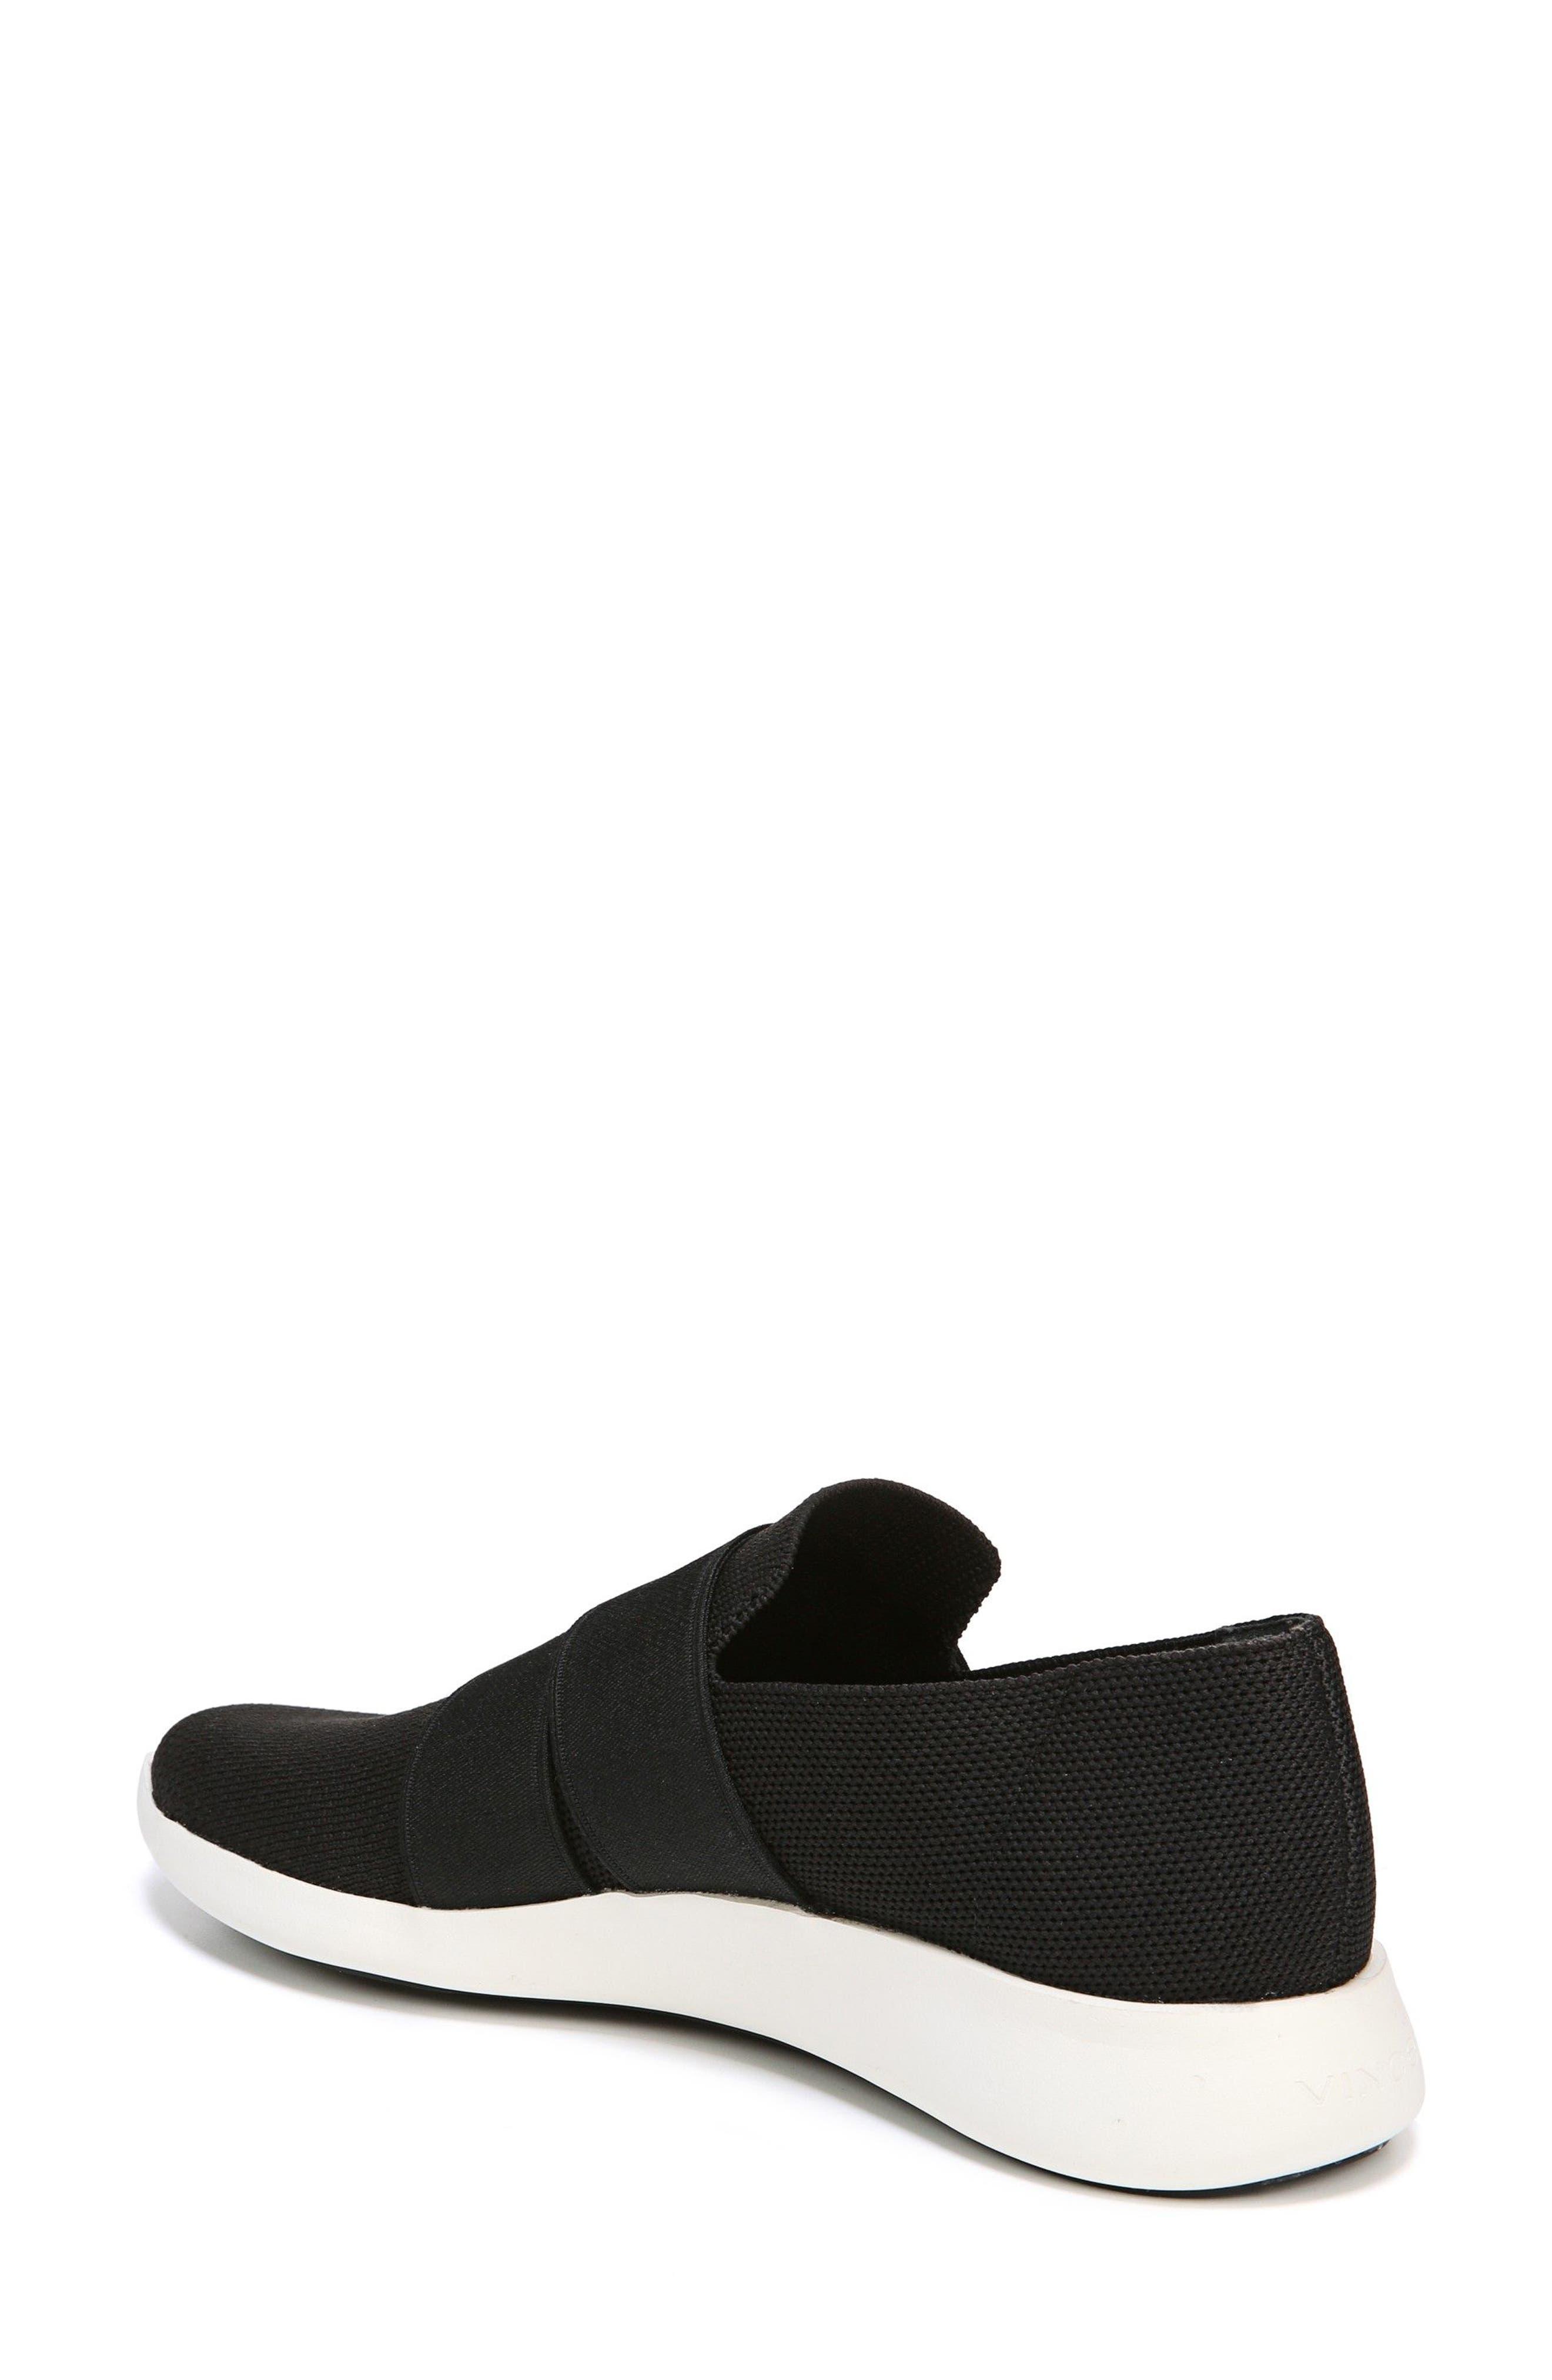 VINCE, Aston Slip-On Sneaker, Alternate thumbnail 2, color, BLACK SOLID KNIT